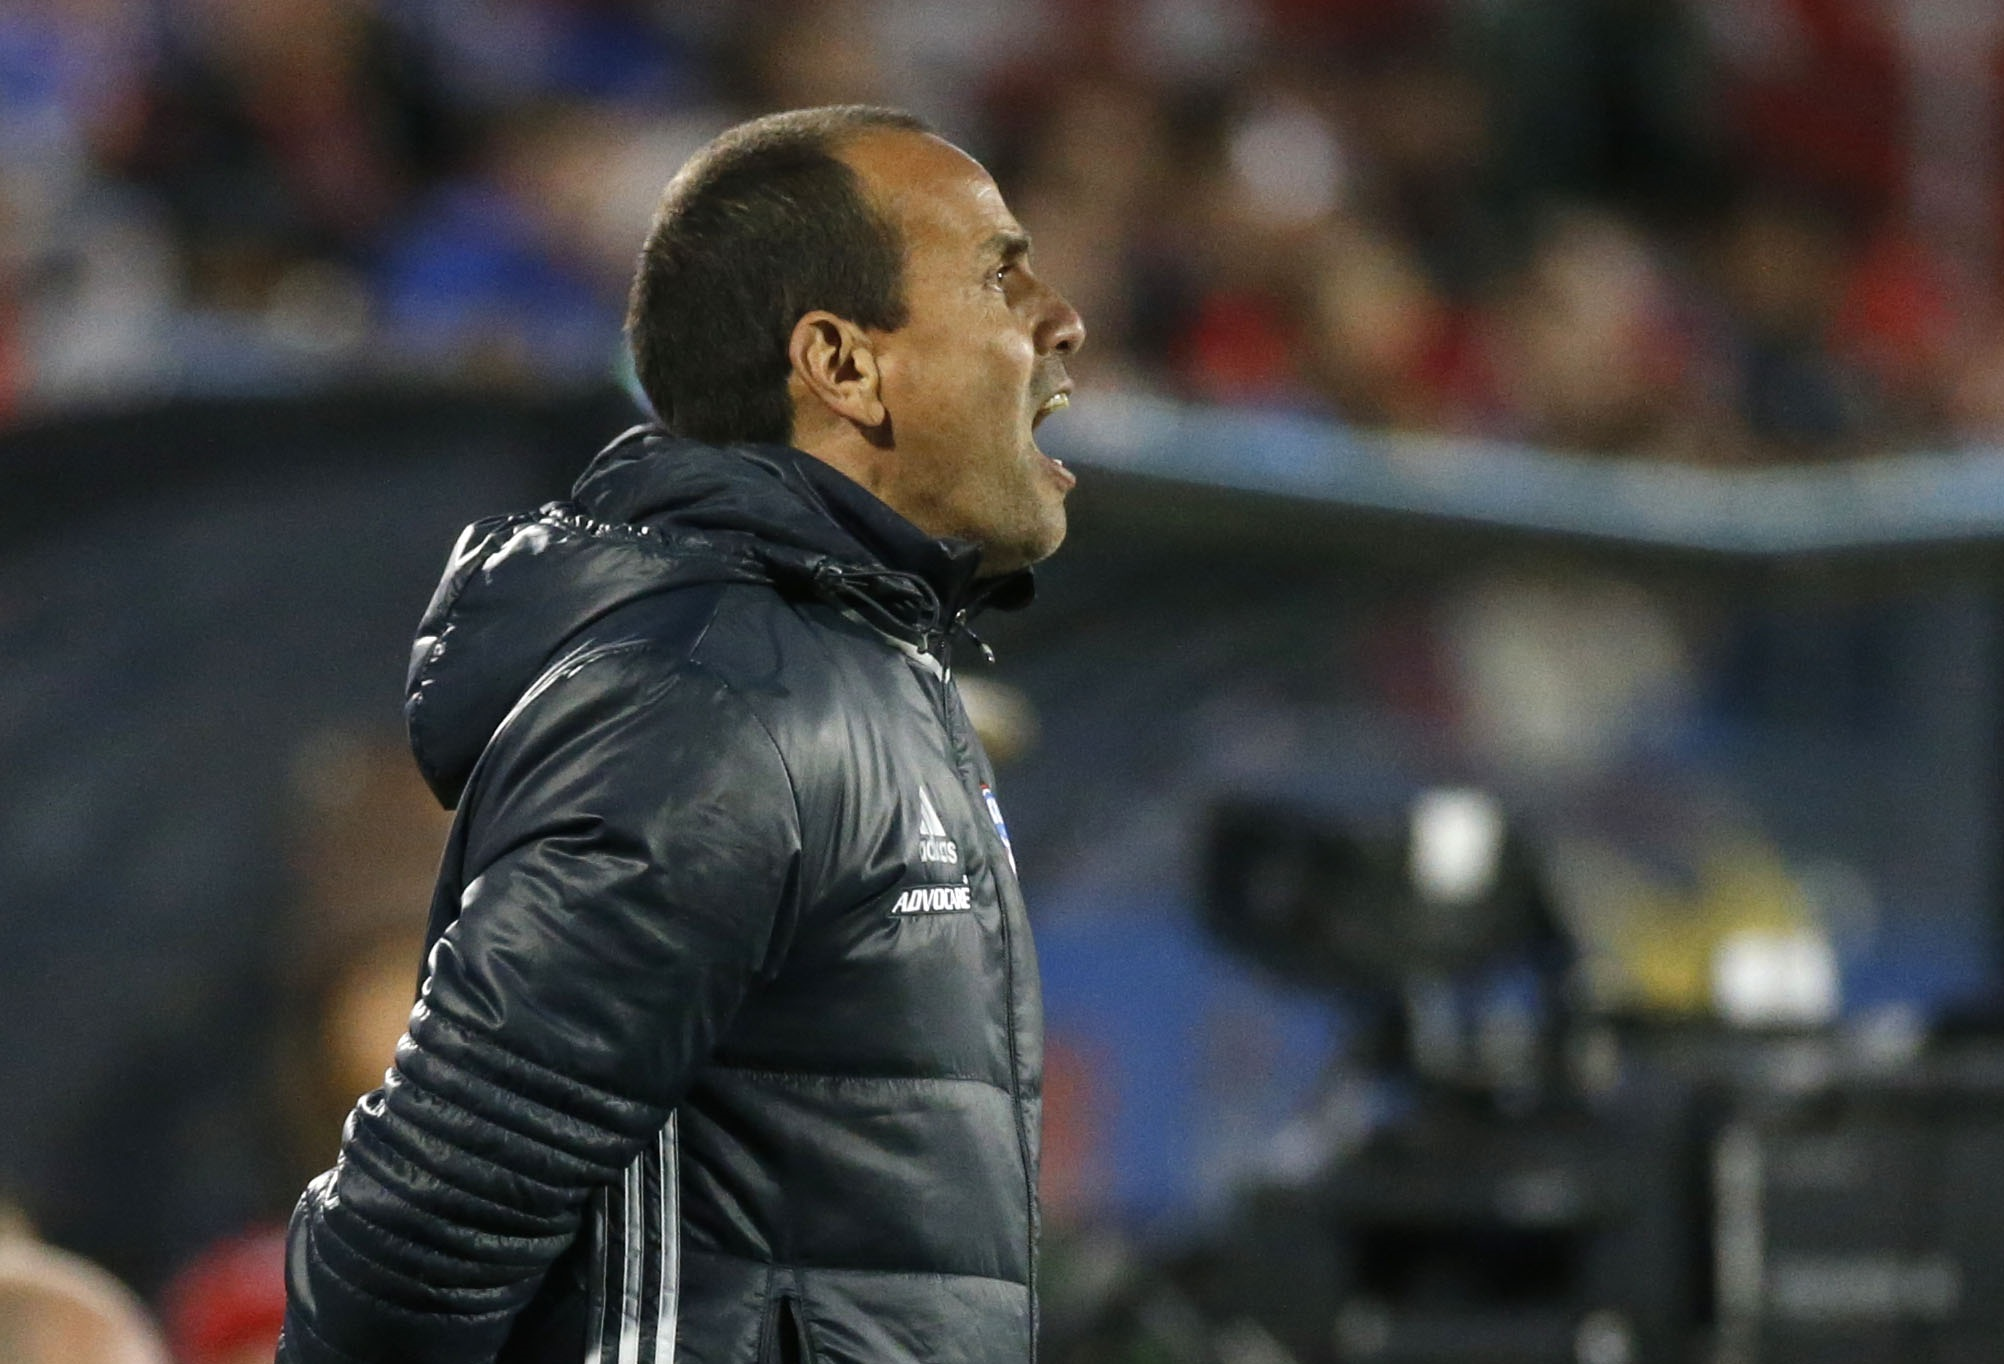 Sounders edge FC Dallas 2-1 as Oscar Pareja still hunts 100th MLS victory